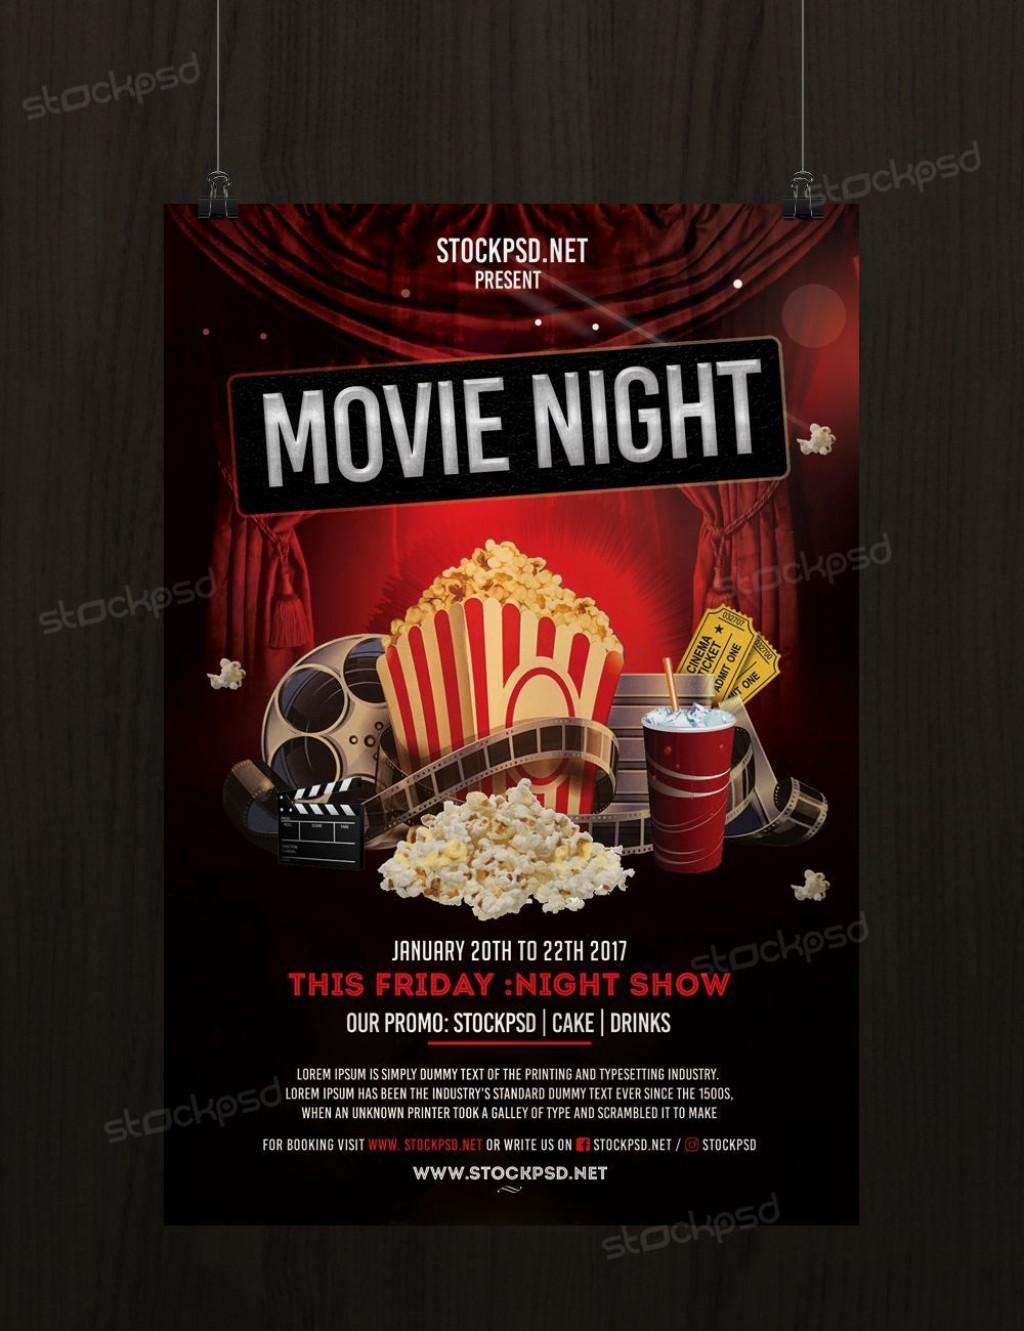 006 Marvelou Movie Night Flyer Template Highest Clarity  Templates Free Microsoft WordLarge